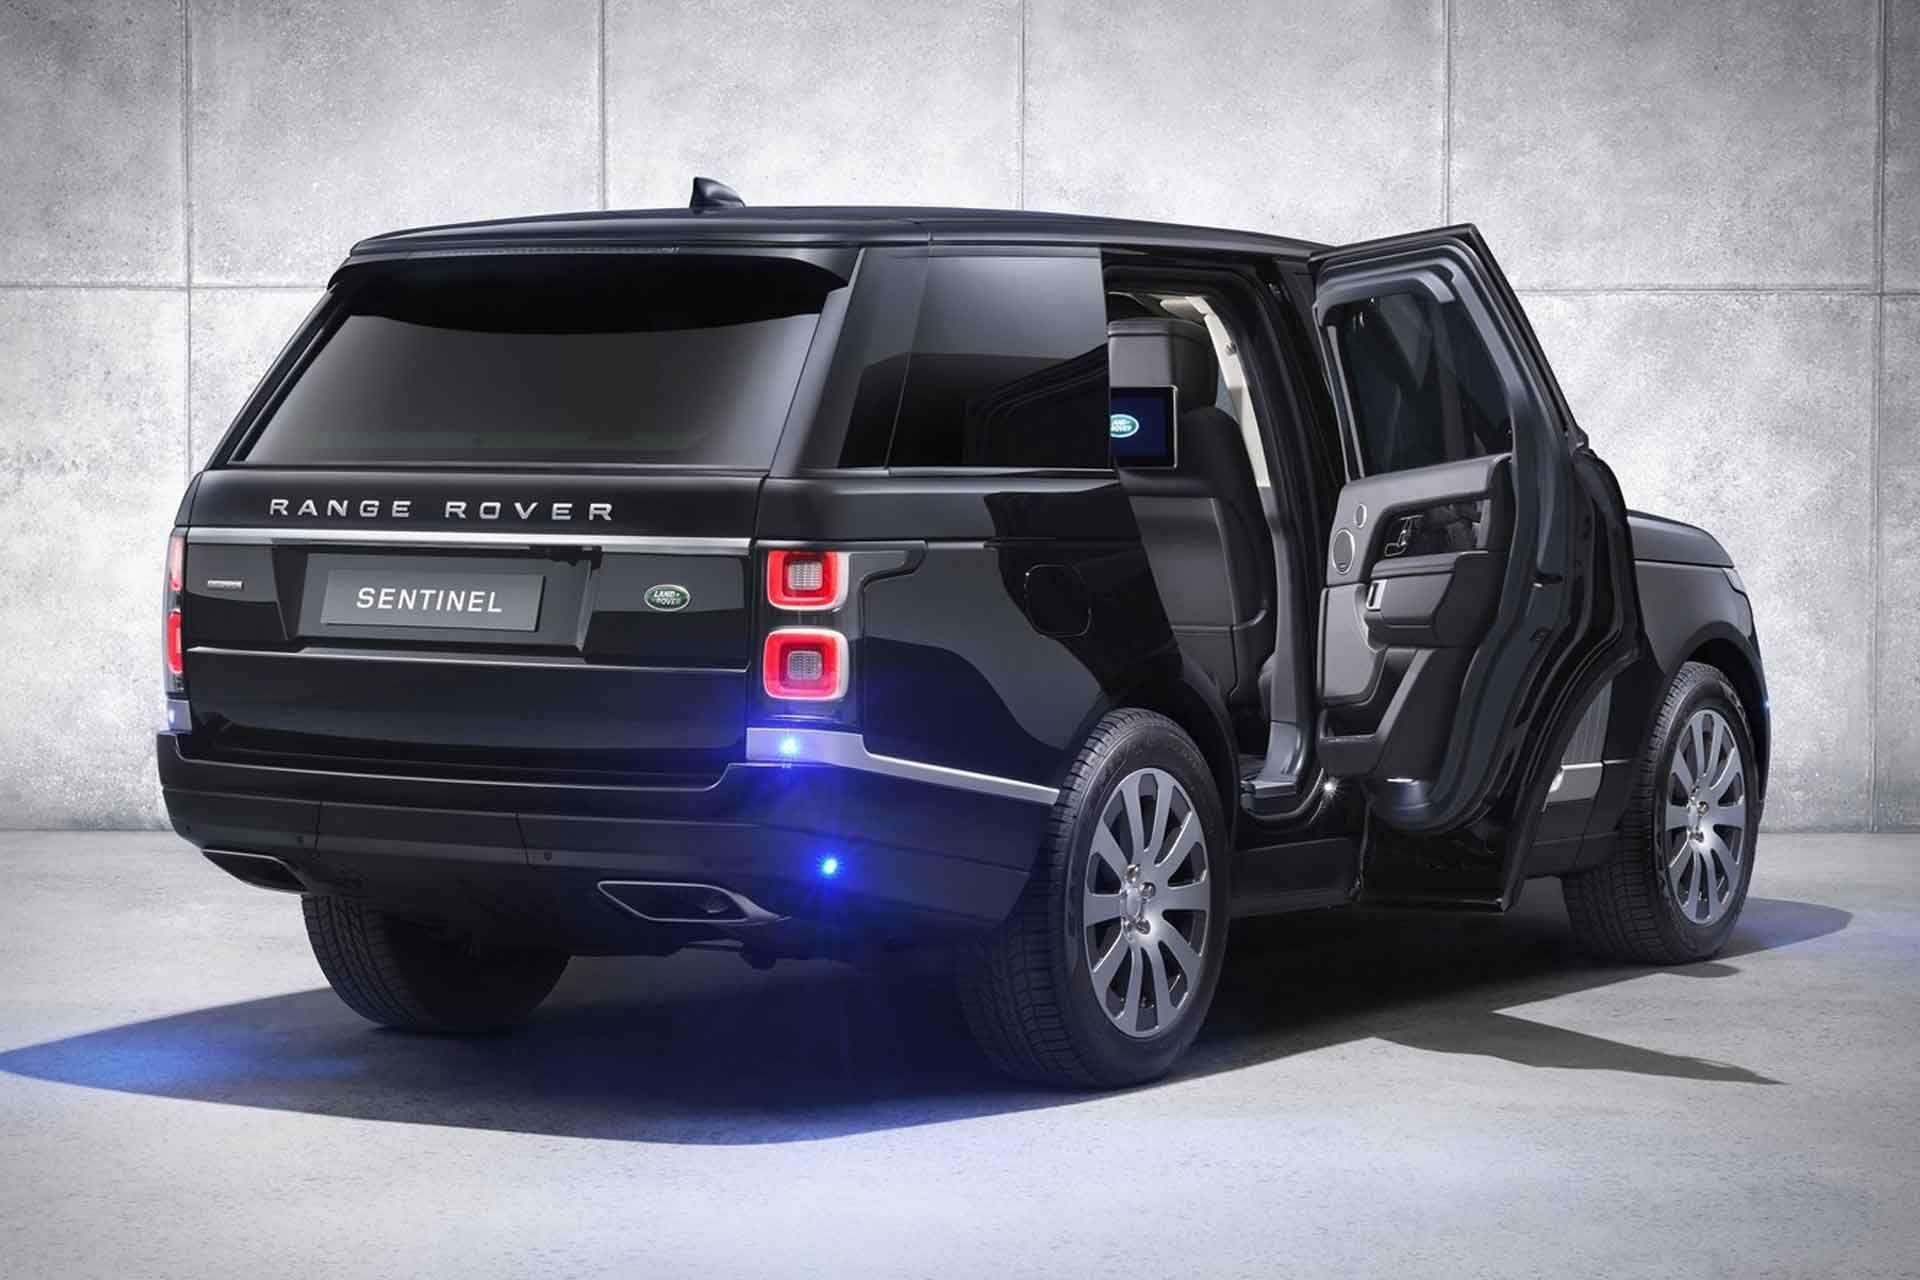 2020 Range Rover Sentinel Armored Suv Land Rover Land Rover Models 2020 Range Rover